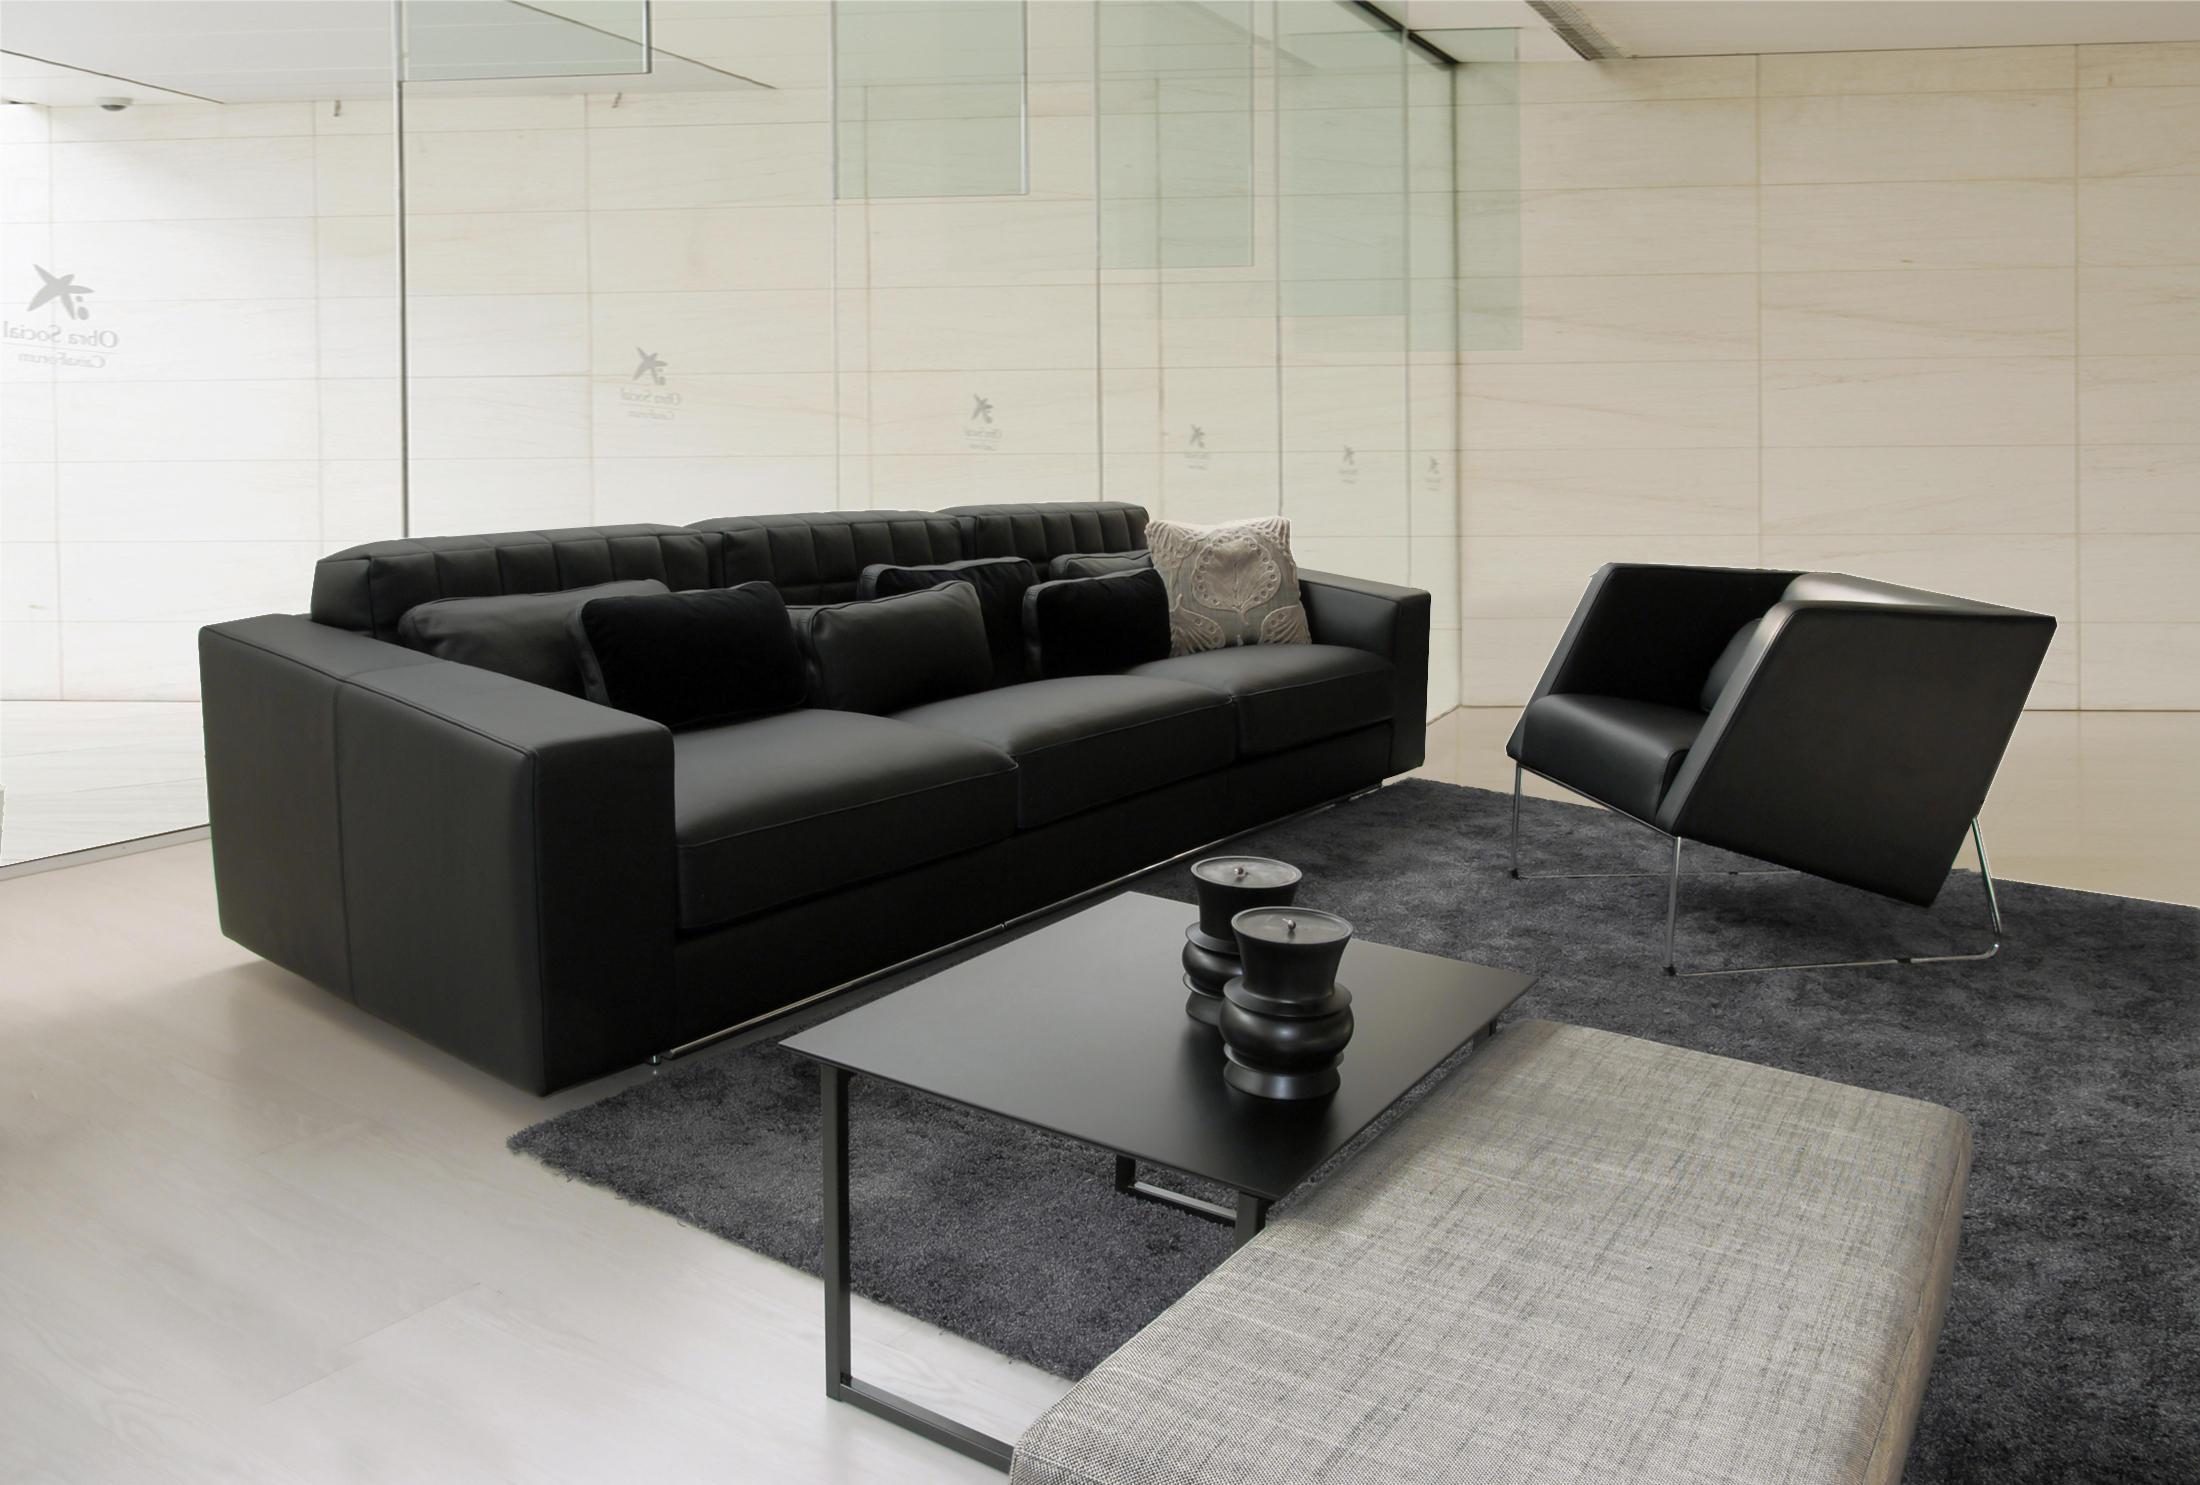 Vip Sofa Sofas From Grassoler Architonic